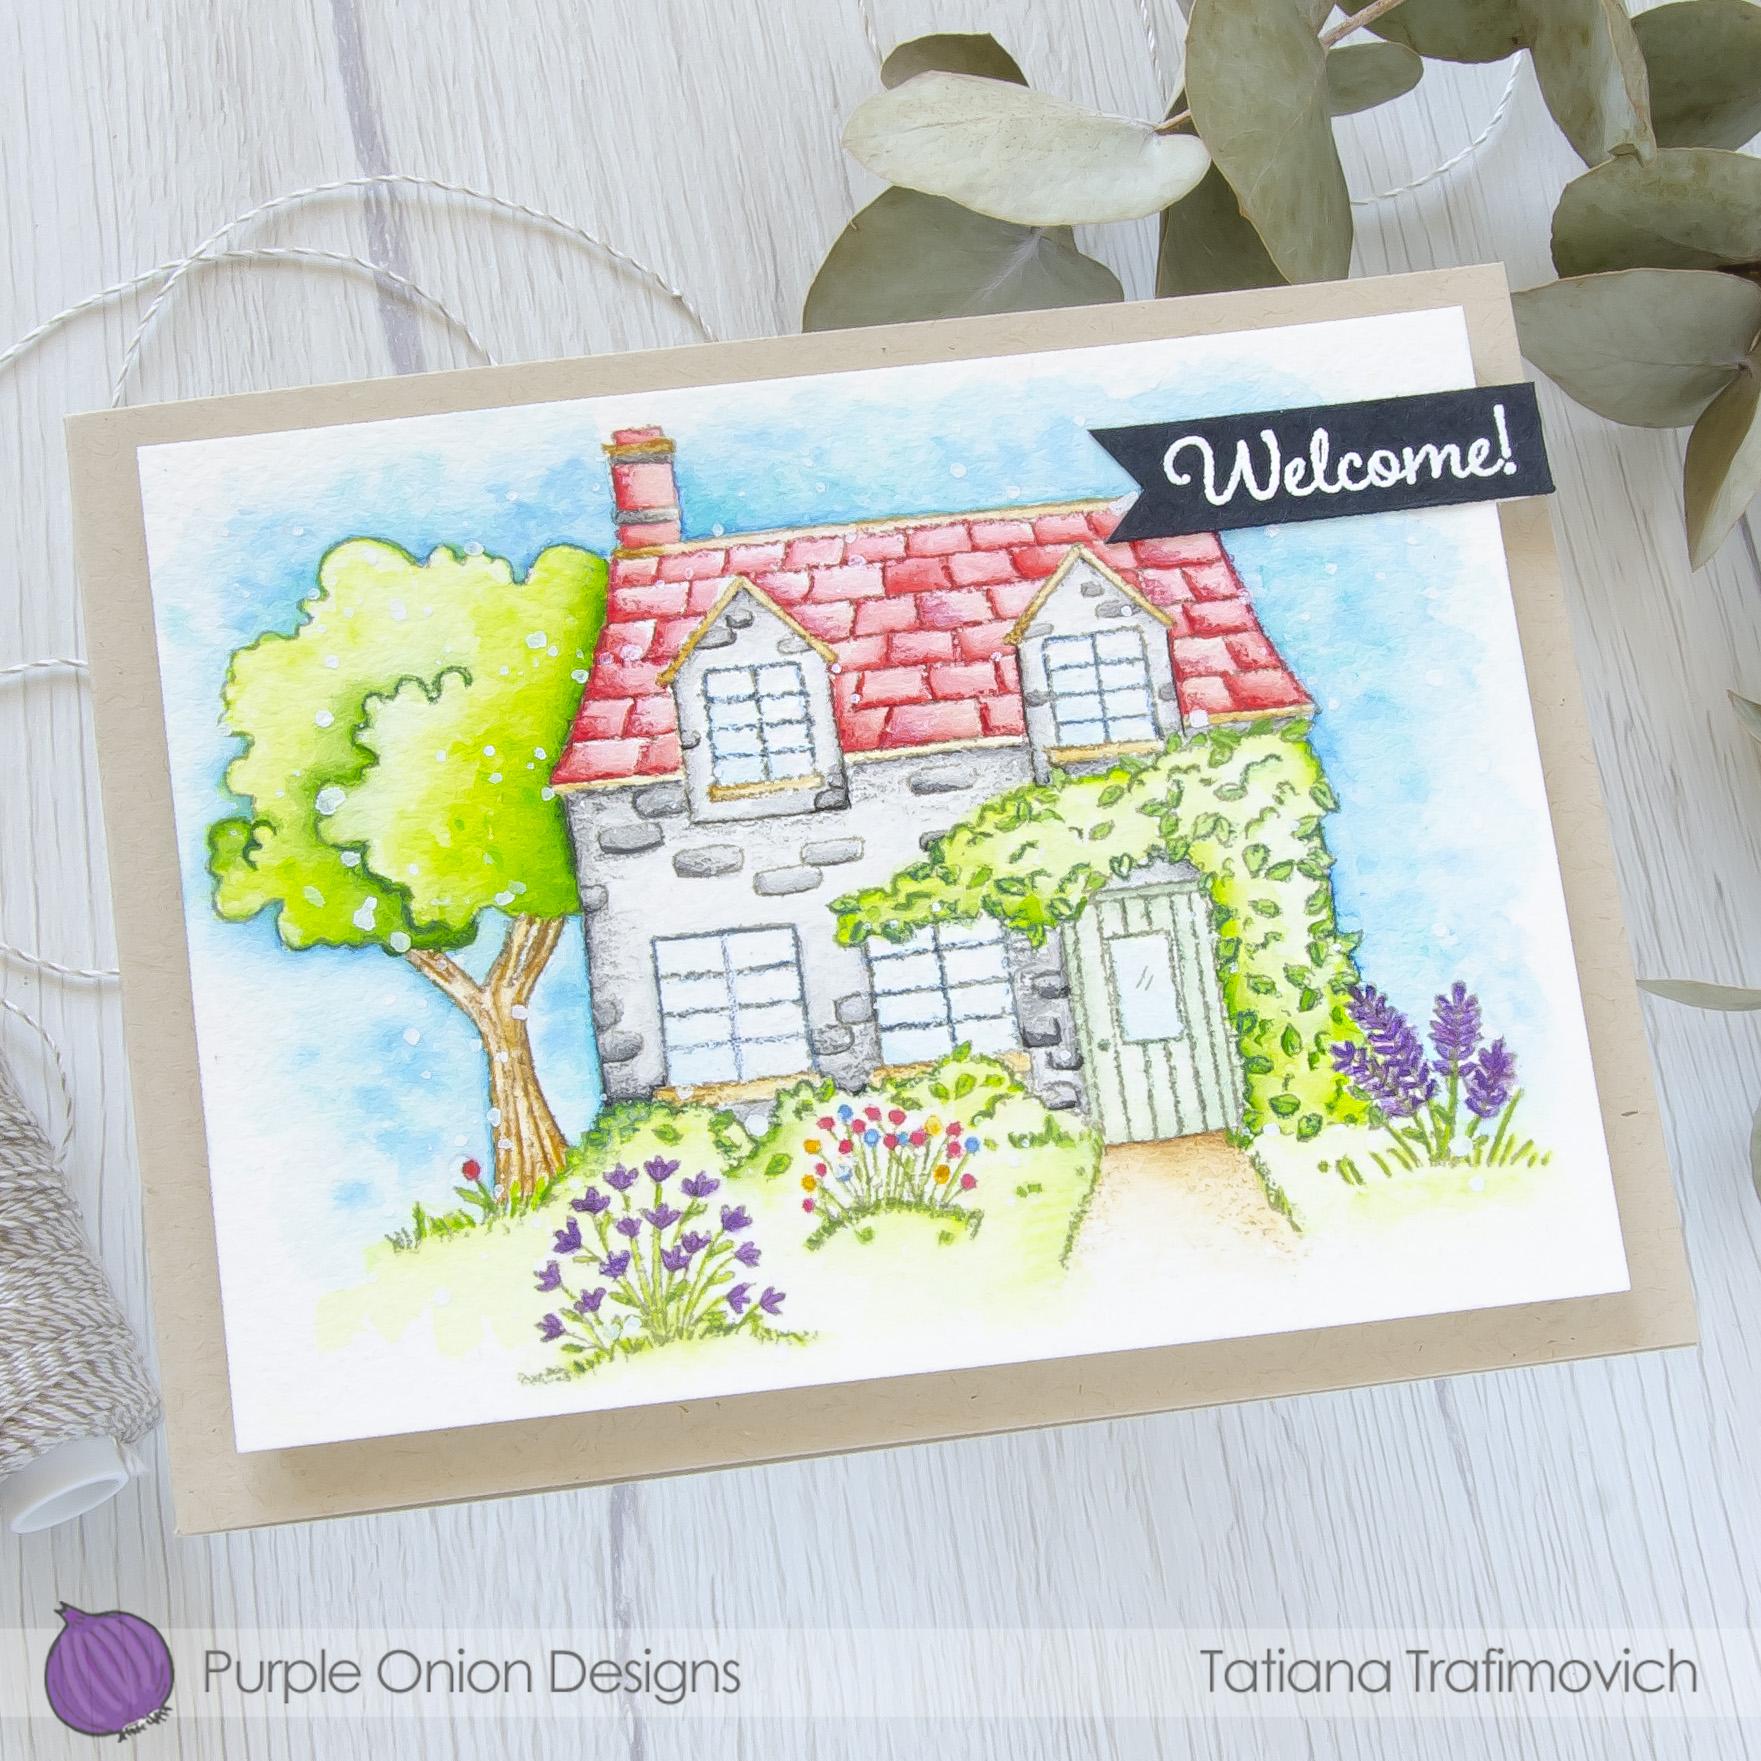 Welcome #handmade card by Tatiana Trafimovich #tatianacraftandart - stamps by Purple Onion Designs